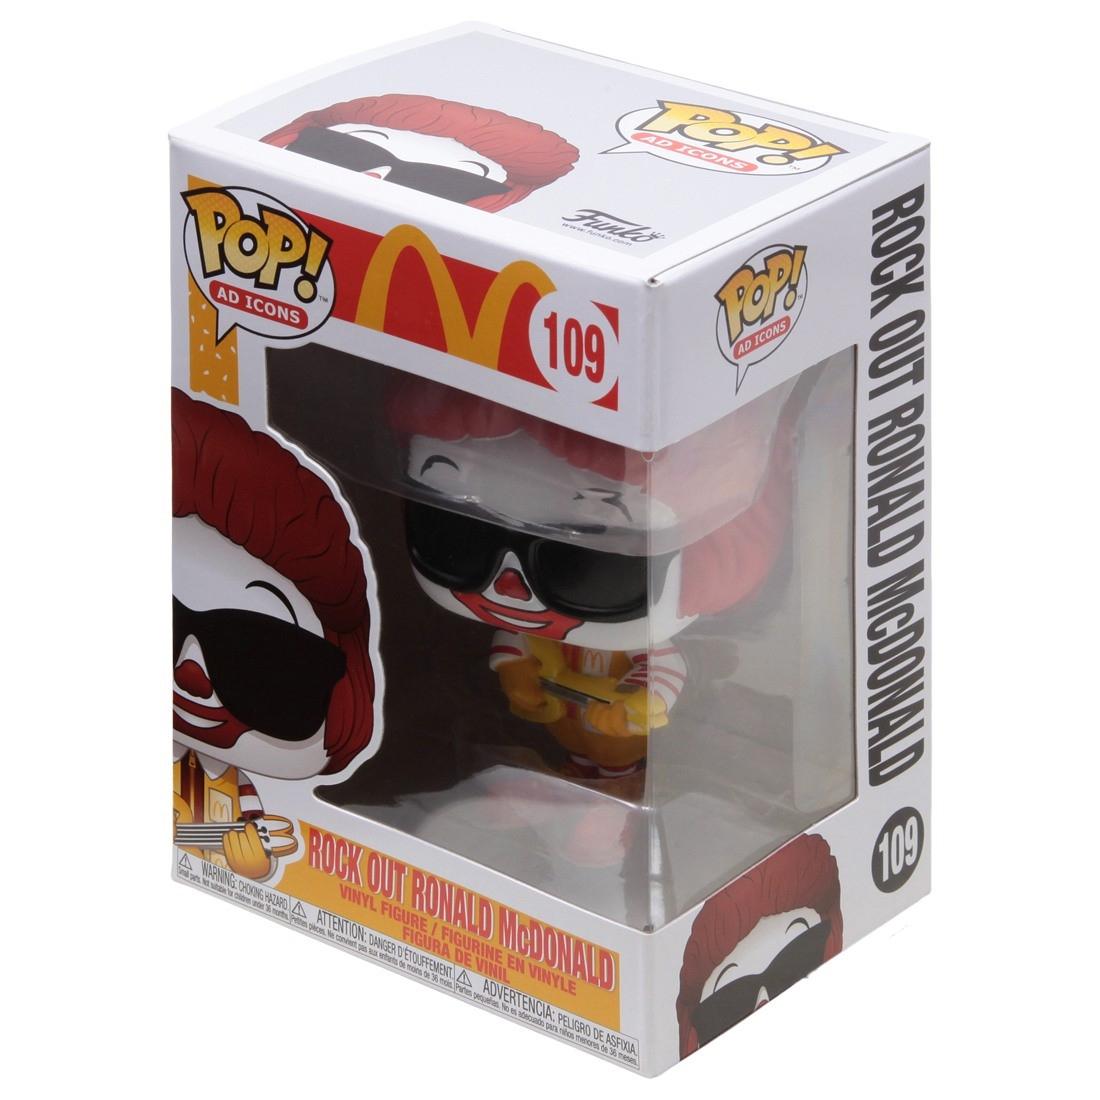 Rock Out Ronald McDonald #109 - Funko Pop! Ad Icons